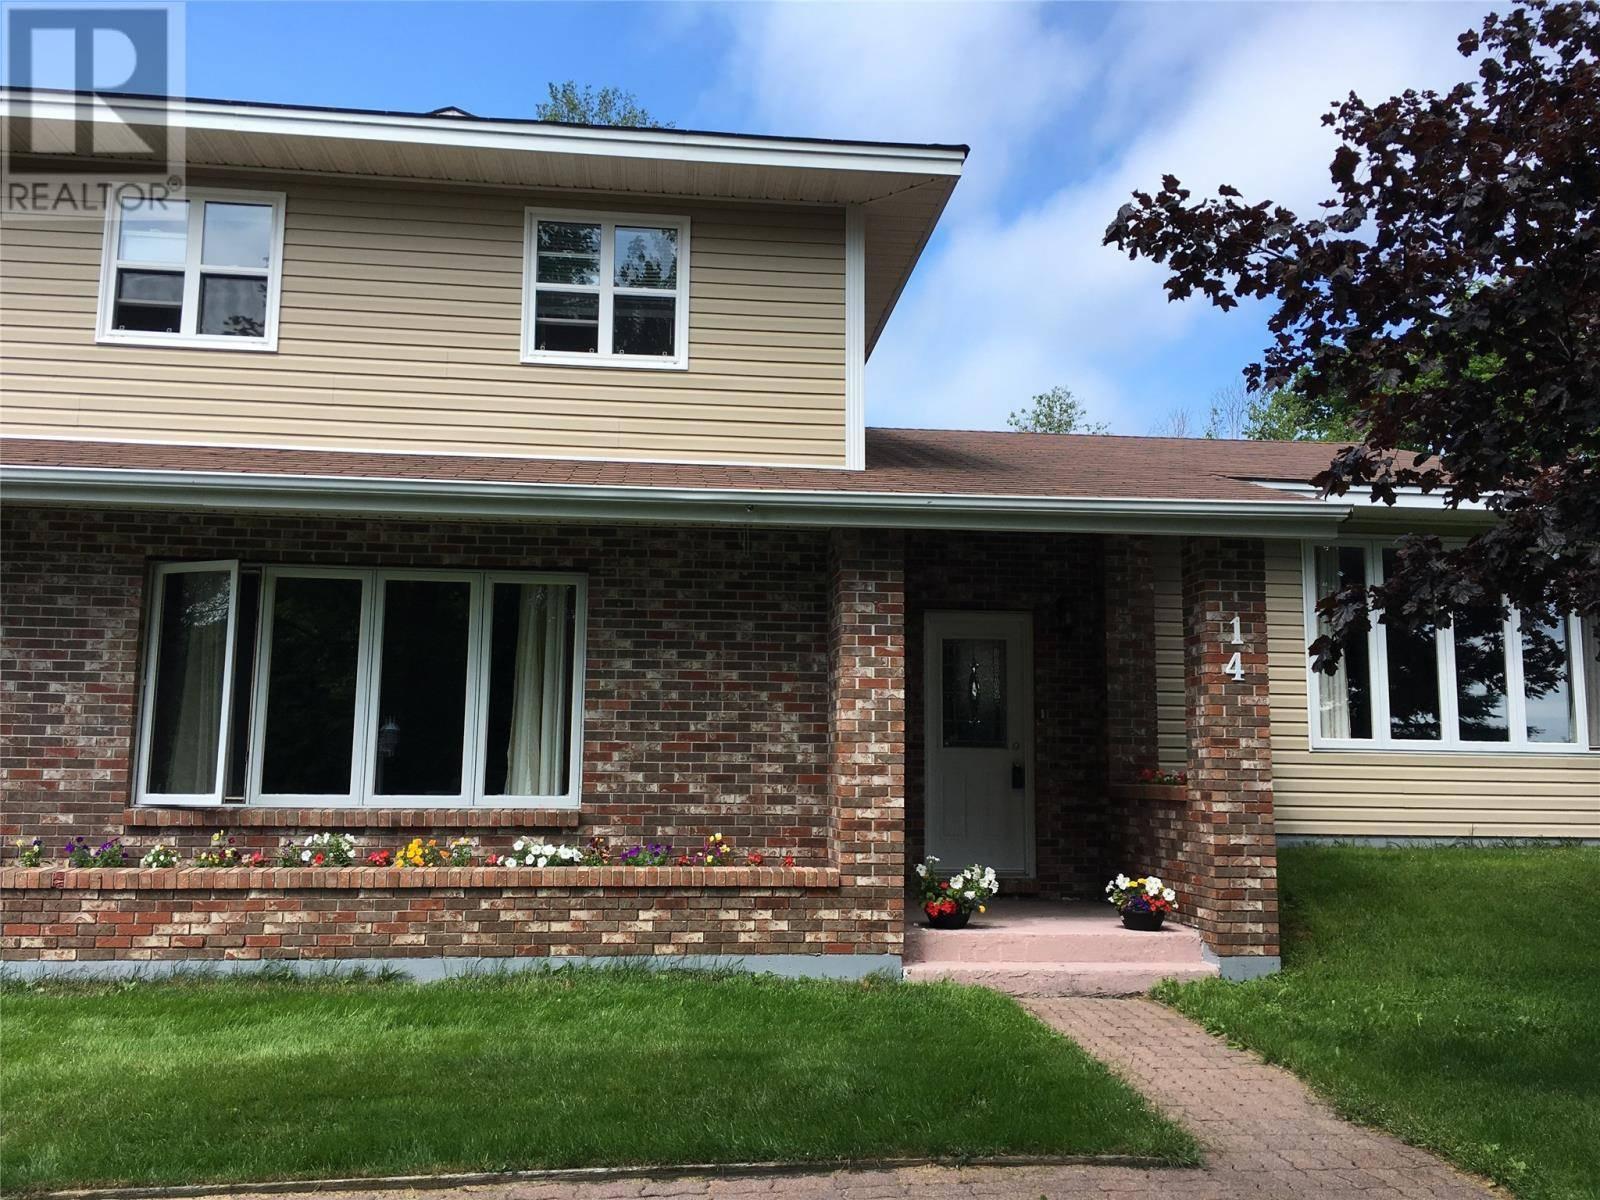 House for sale at 14 Riverview Dr Clarenville Newfoundland - MLS: 1209922